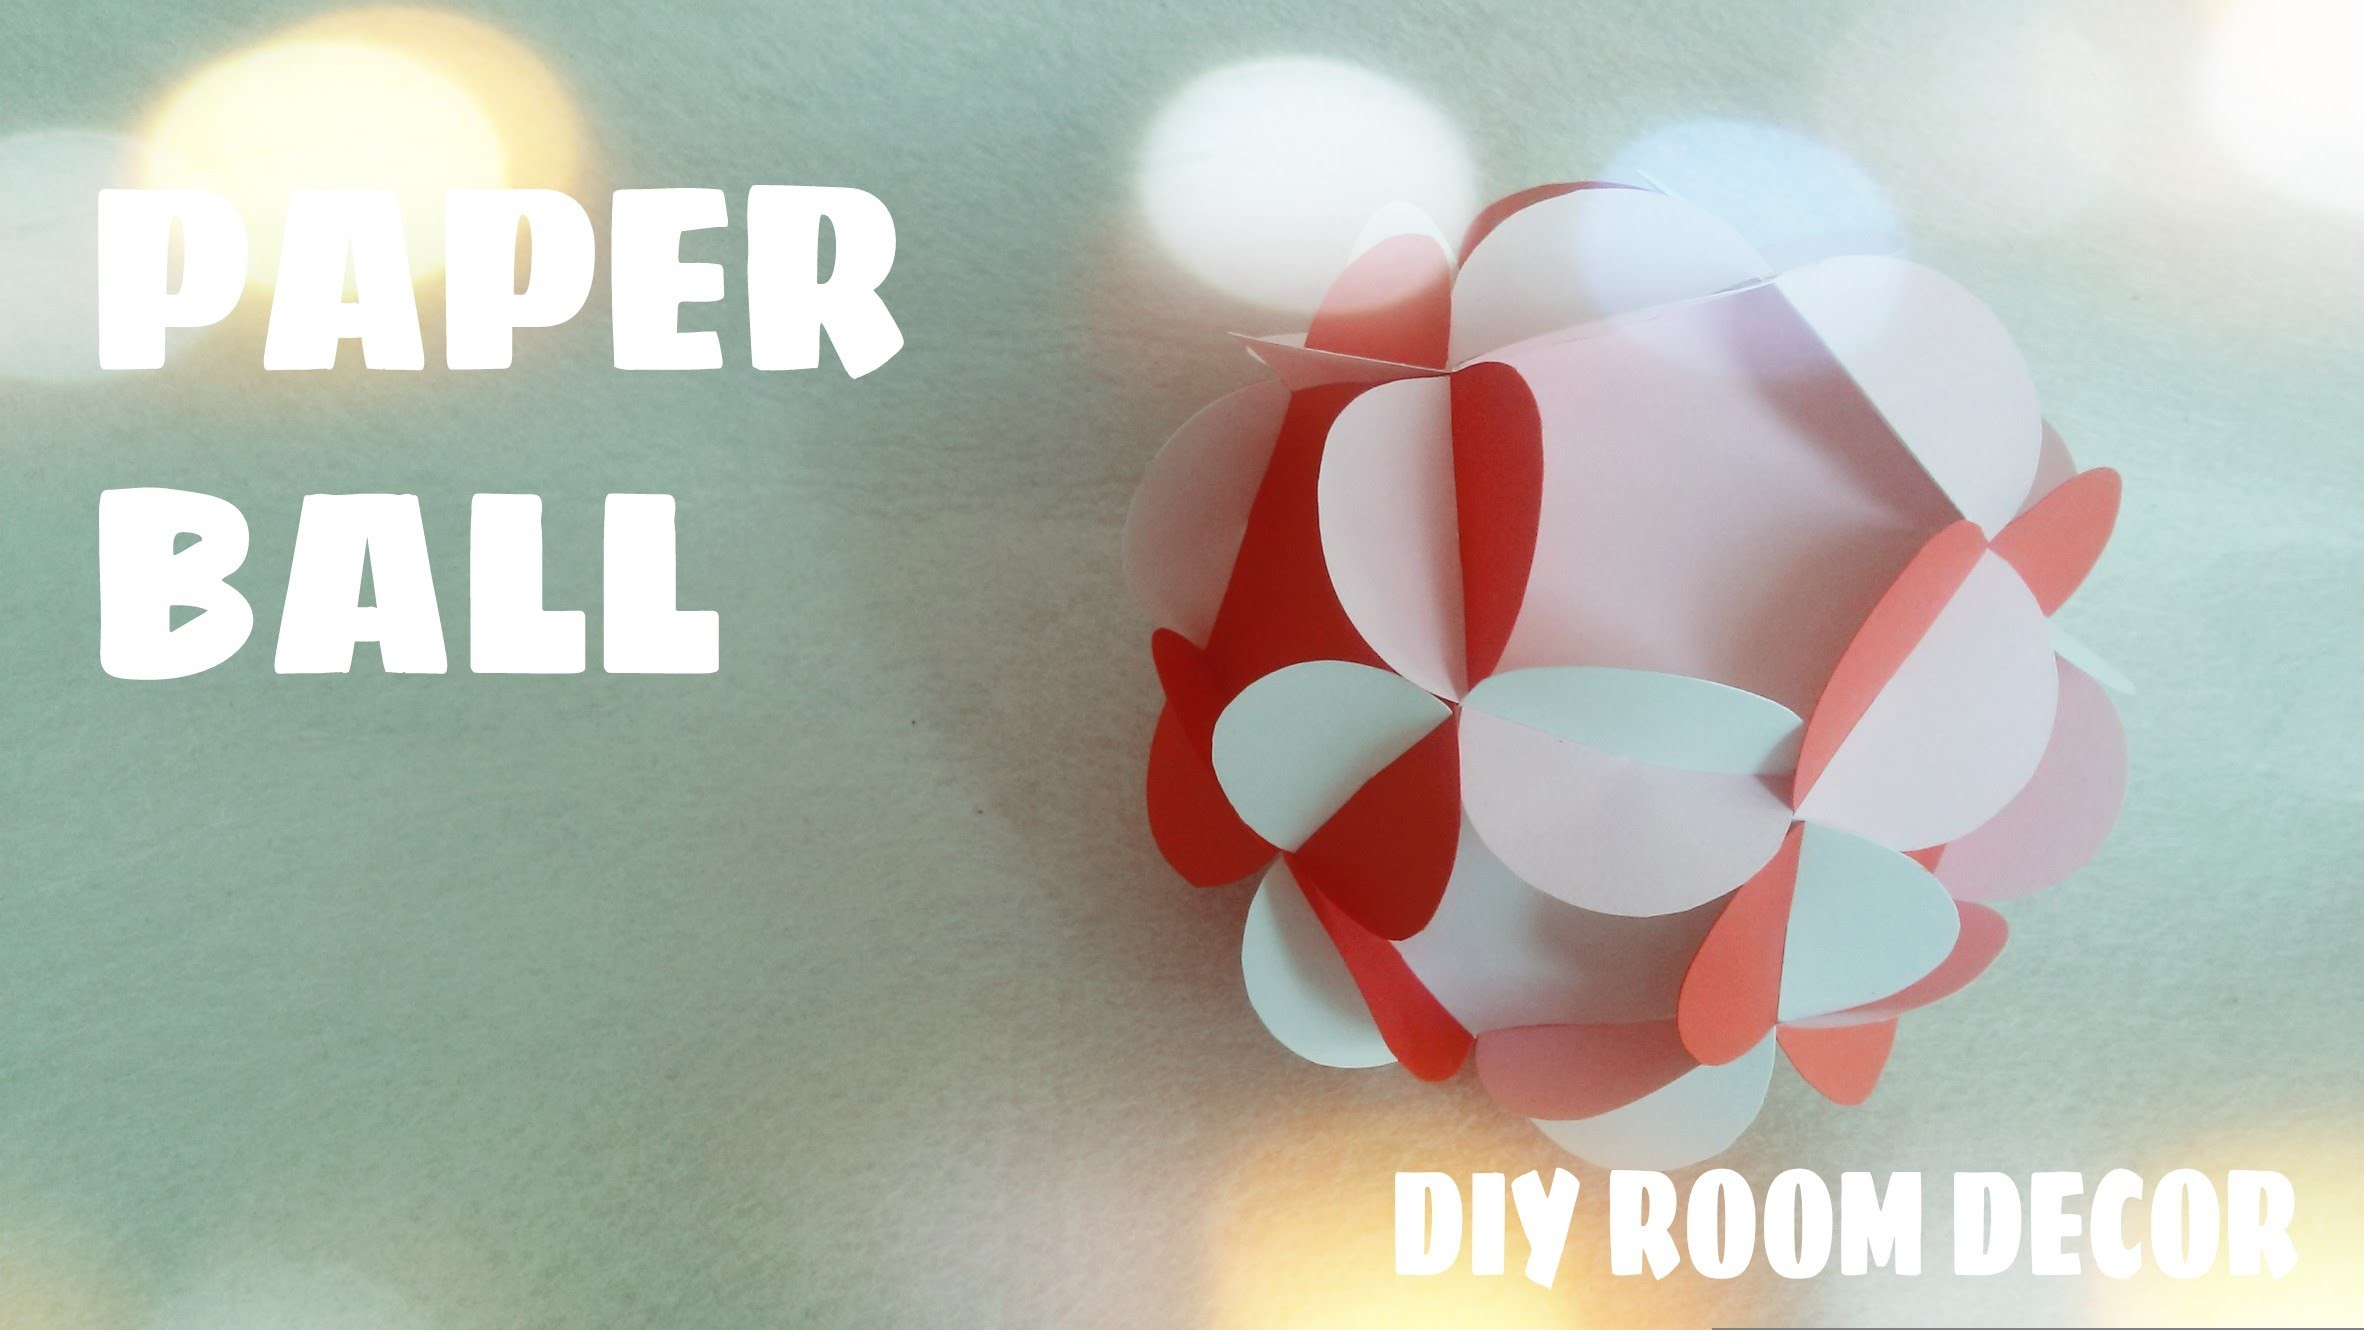 DIY Room Decor - 3D Paper Ball Tutorial